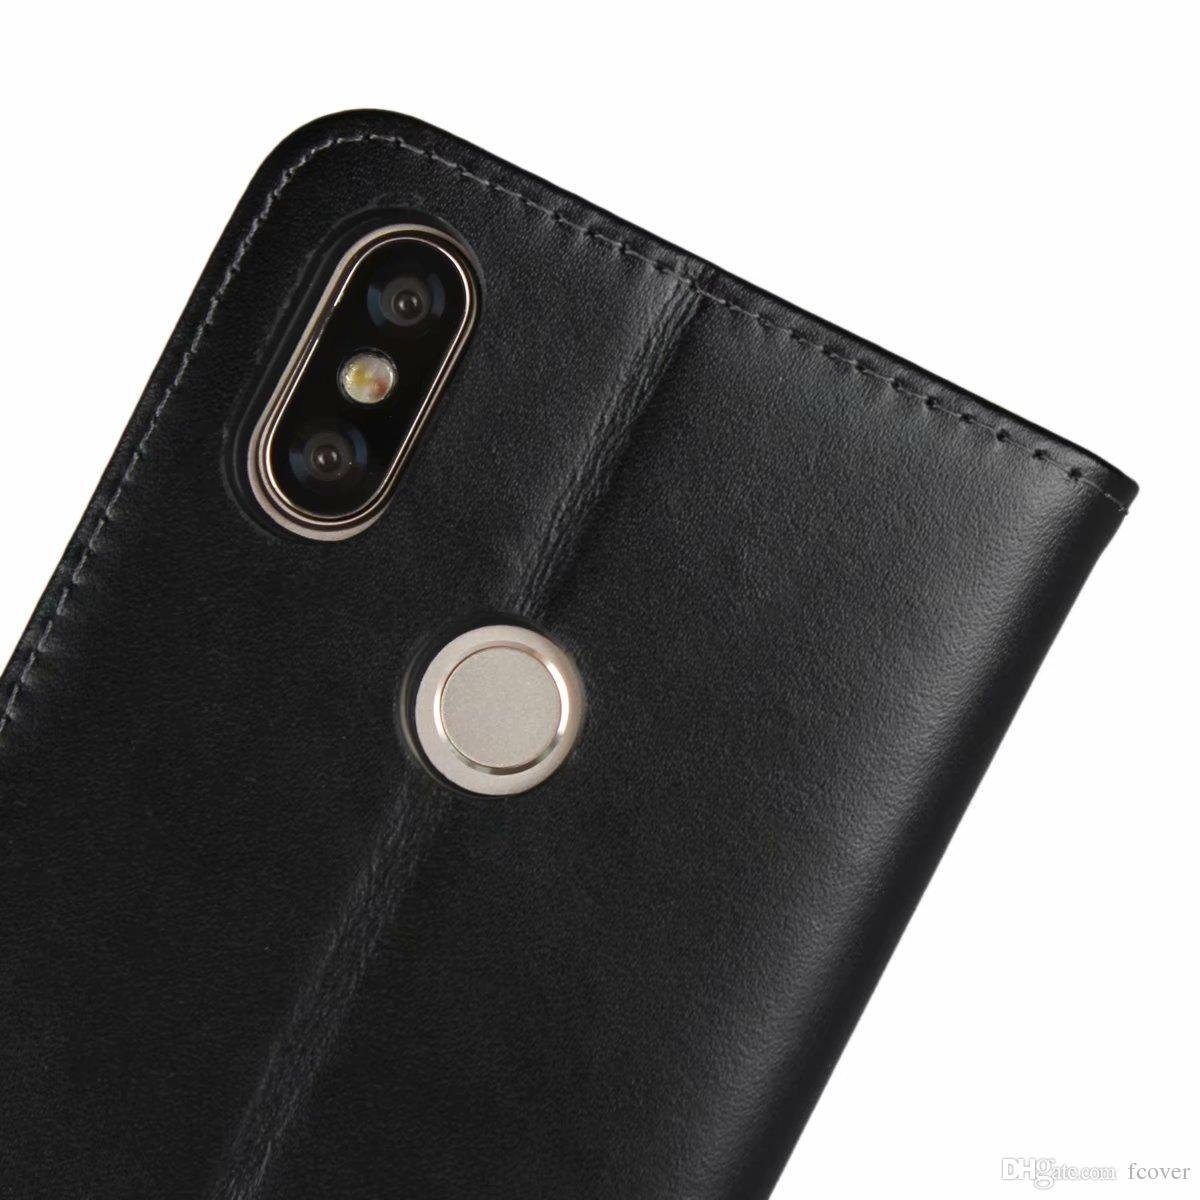 For Xiaomi Redmi Note 5 & Redmi S2/Mix 2S/Mi A2/Mi 6X Redmi K20 Pro Flip Case Genuine Leather Book Stand Protection Card Shell Wallet Cover